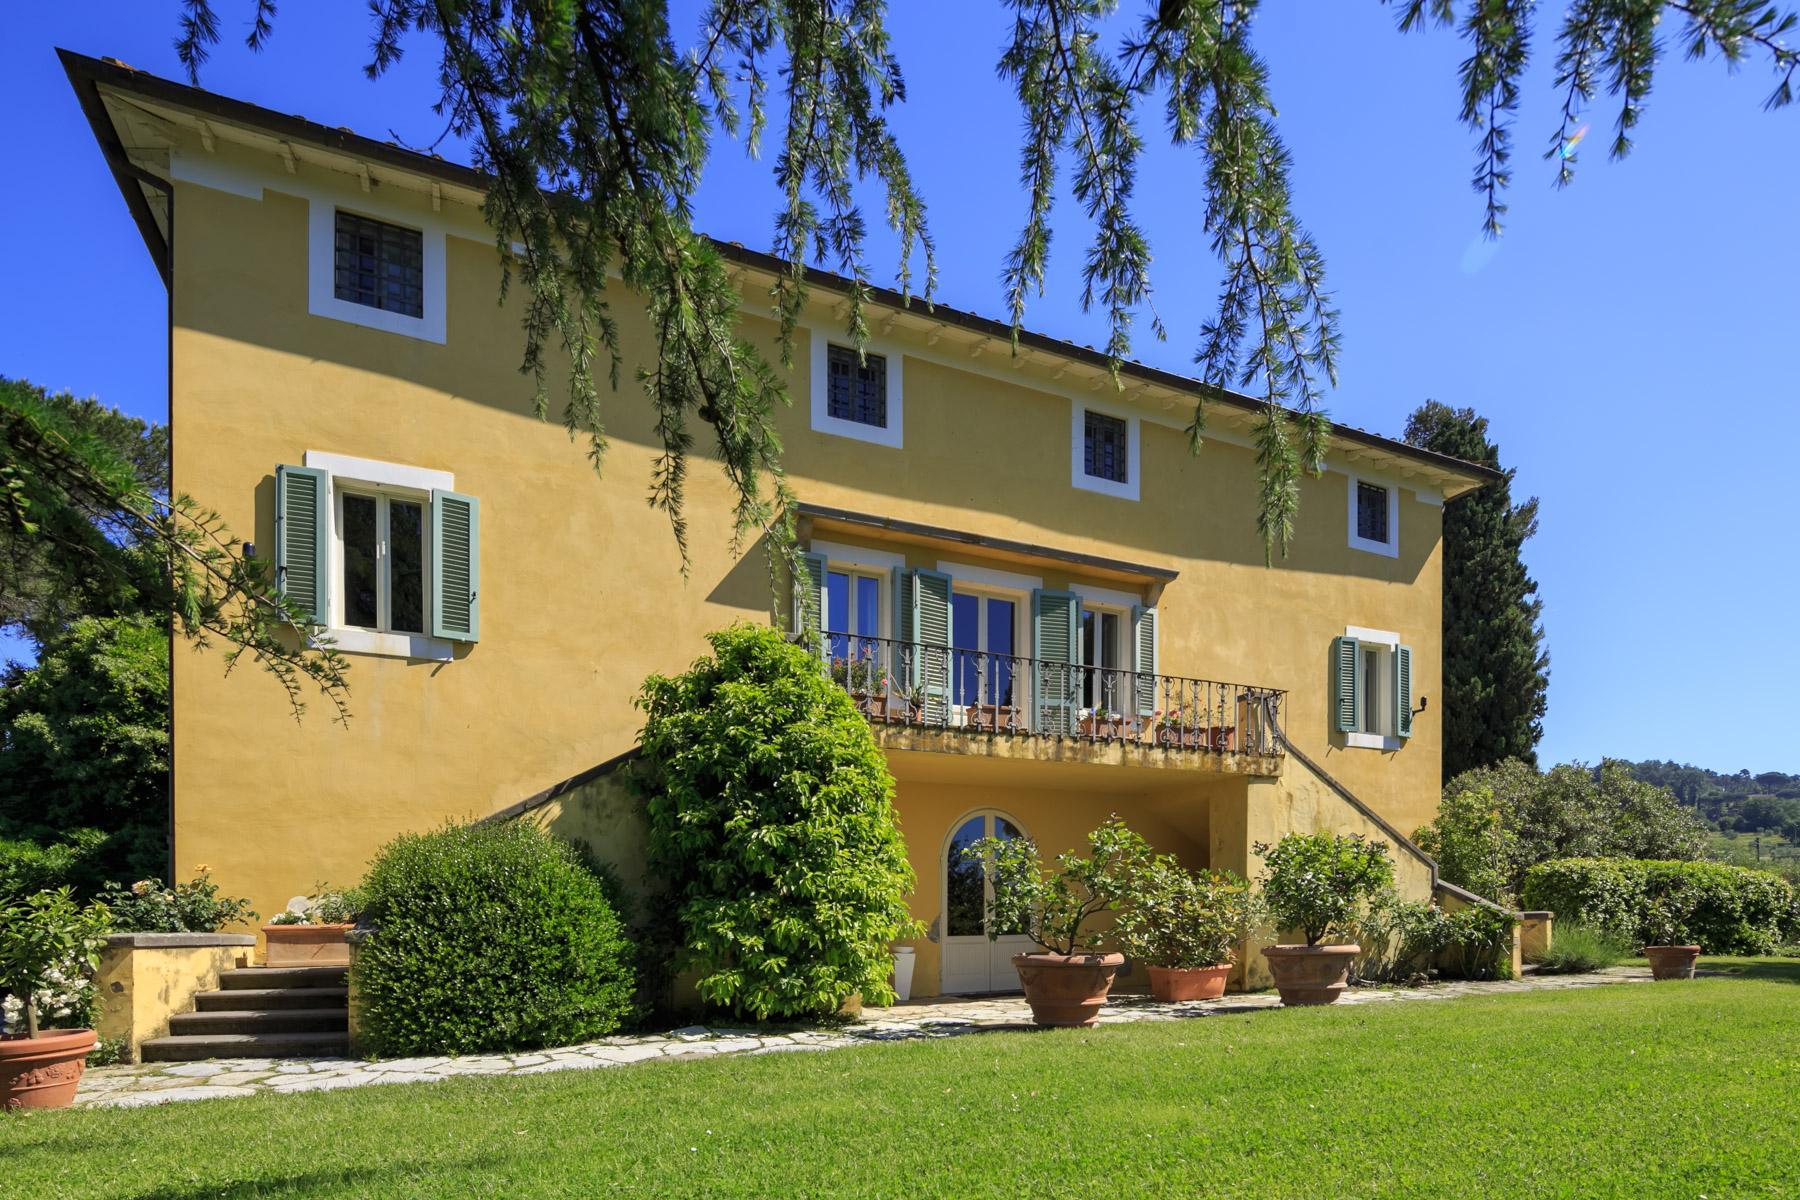 Elegant villa on the Tuscan hills - 10